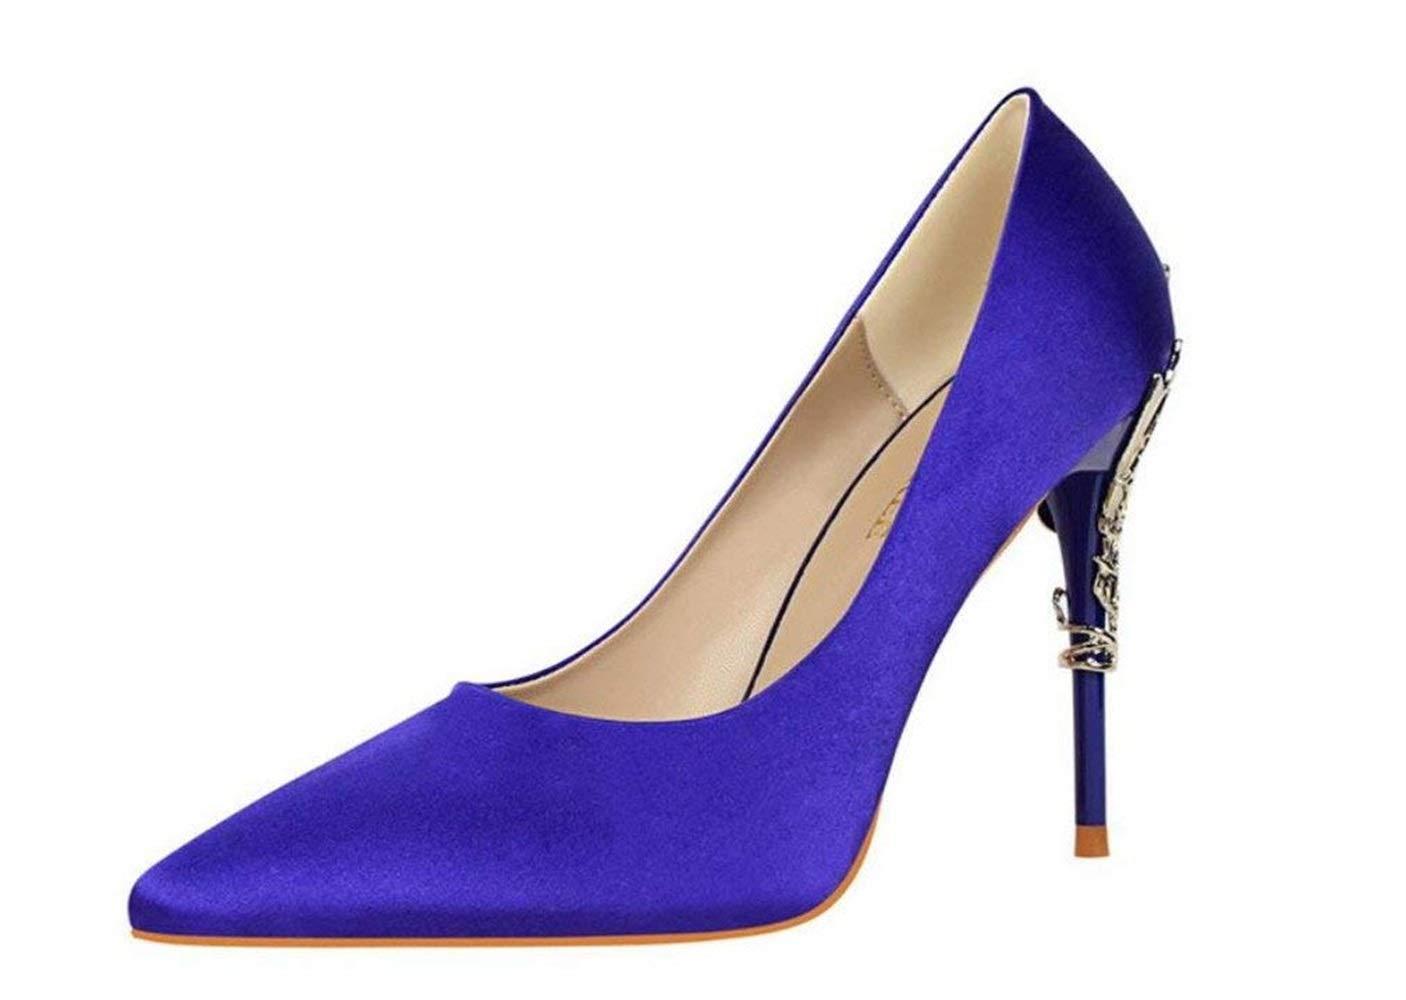 Moontang Süßigkeit-Farben-purpurrote hohe Absatz-Sandelholz-Satin wies niedrige niedrige niedrige mittlere Kätzchen-Fersen-Stilett-Ferse-Damen-Frauen-Mädchen-Damen-Hof-Schuhe nach 7b81a2